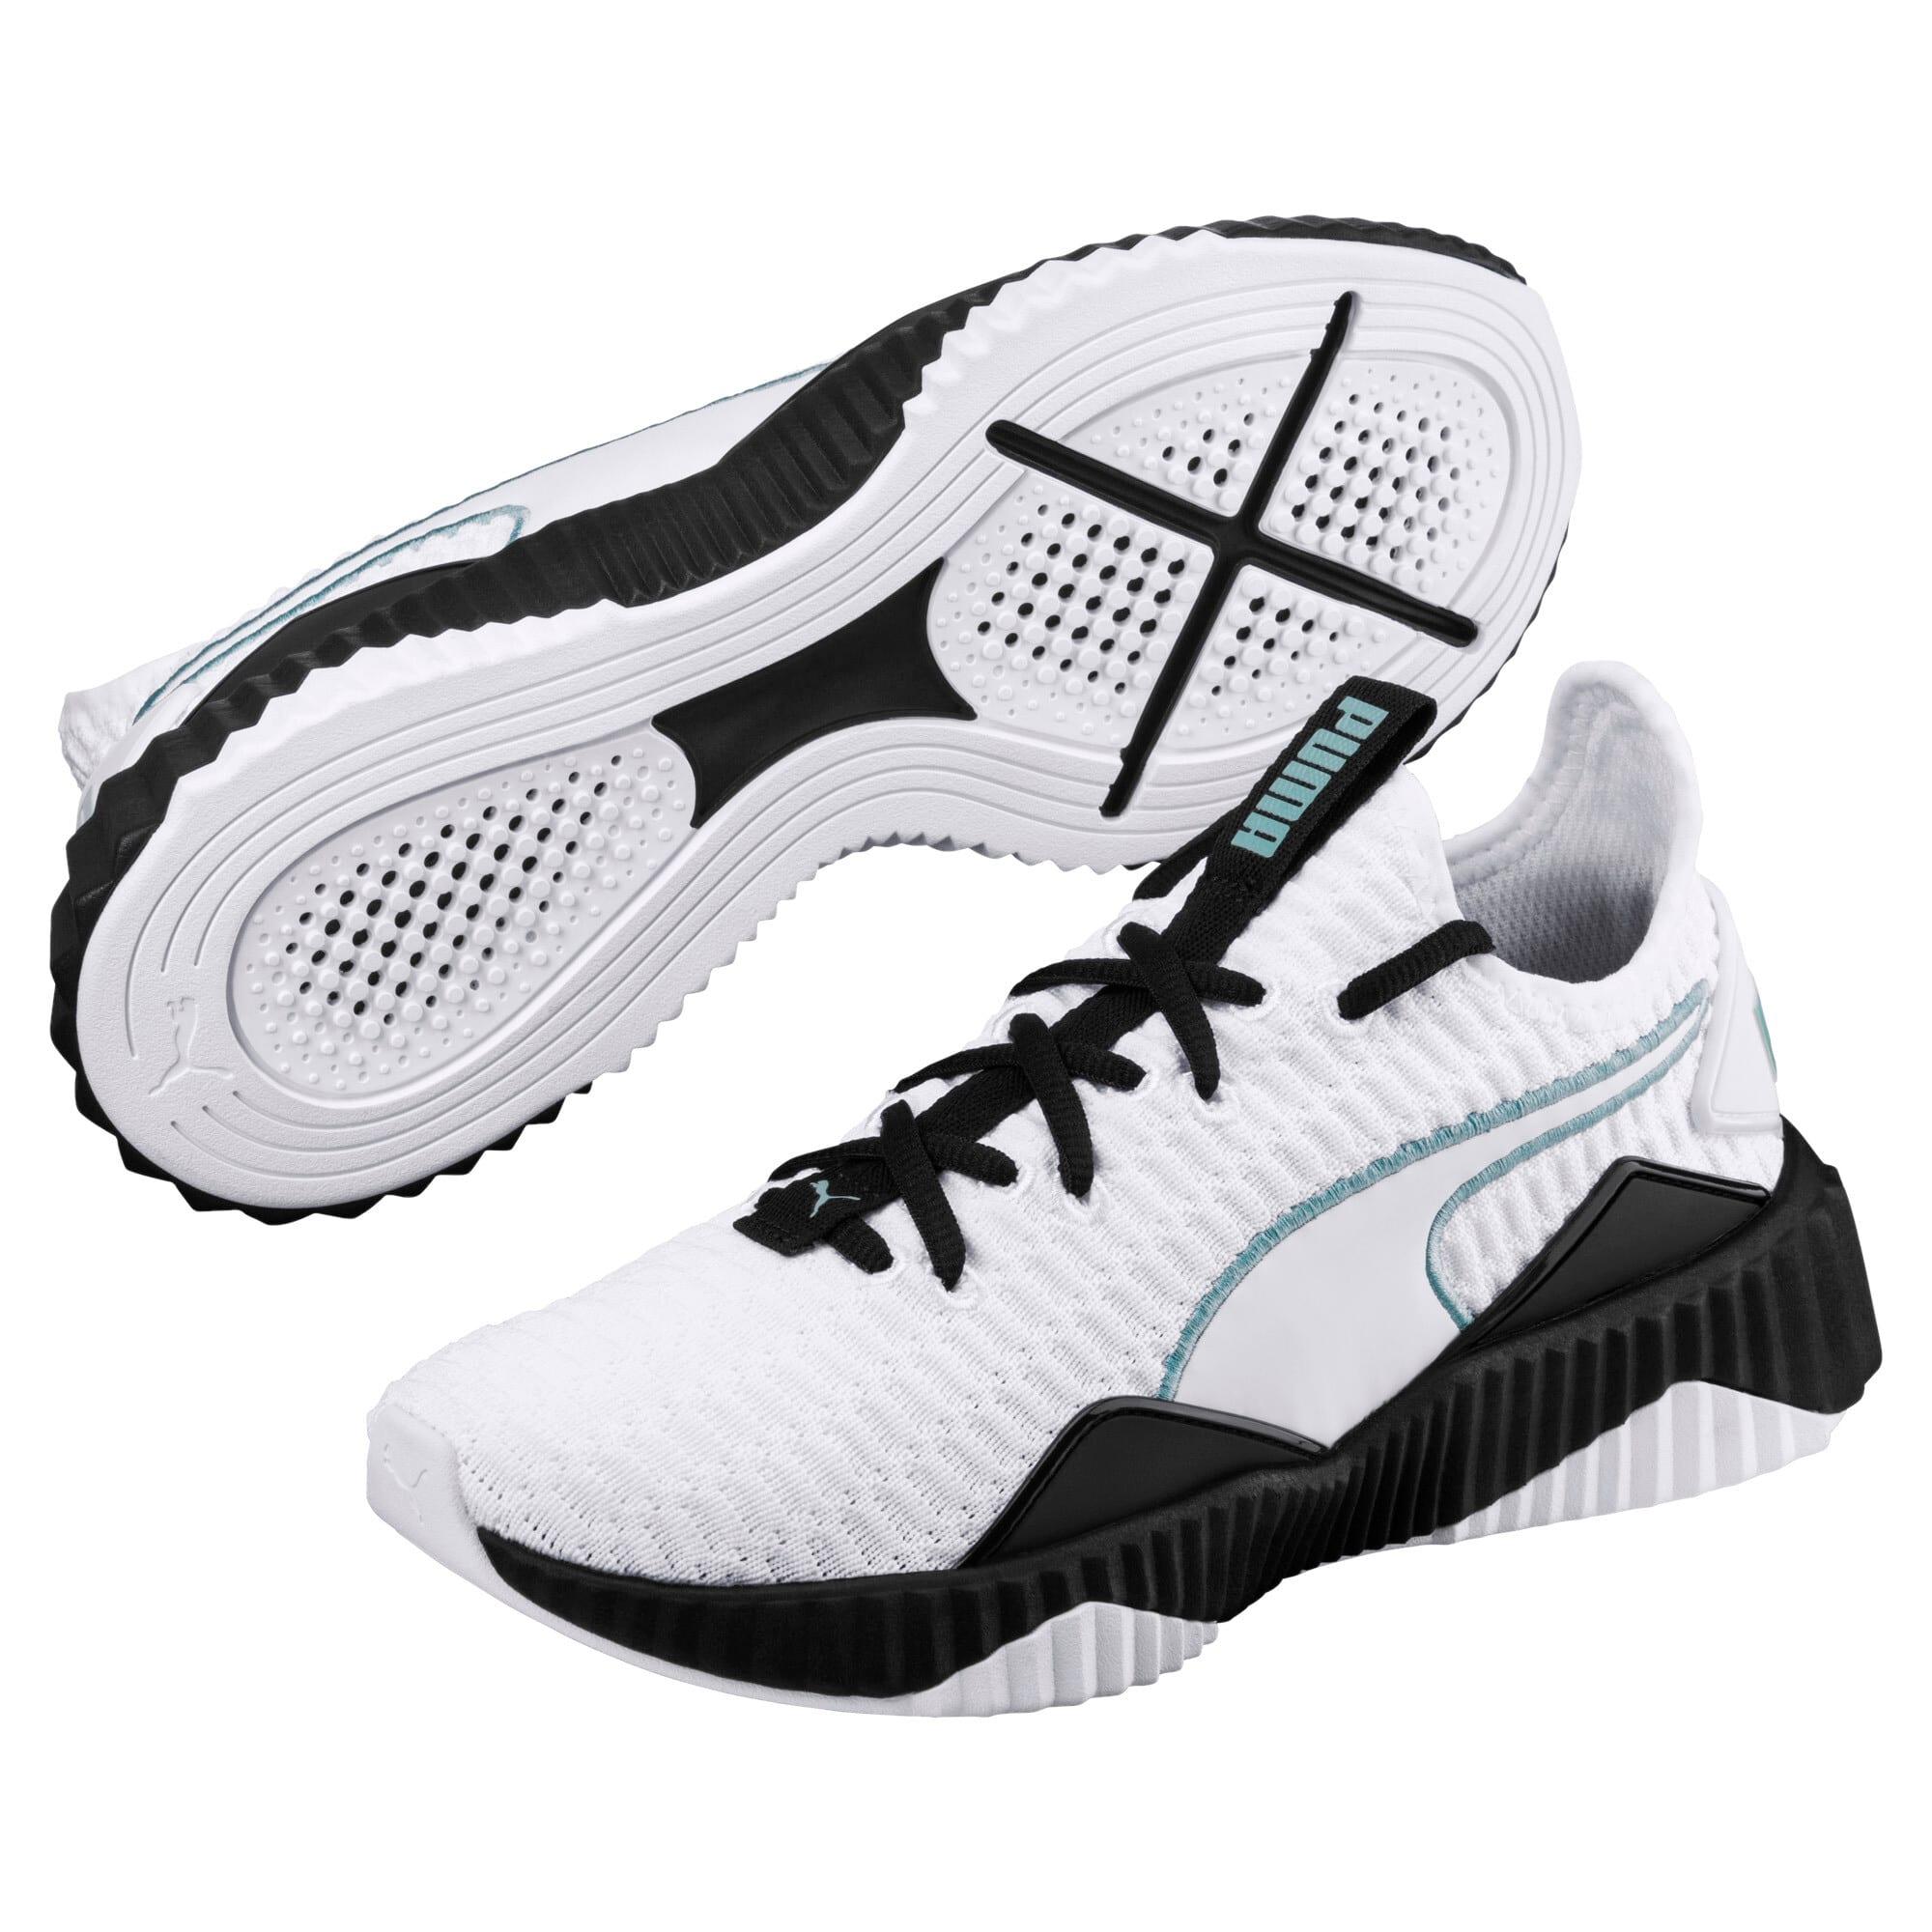 Thumbnail 2 of Defy Damen Sneaker, Puma White-Puma Black, medium